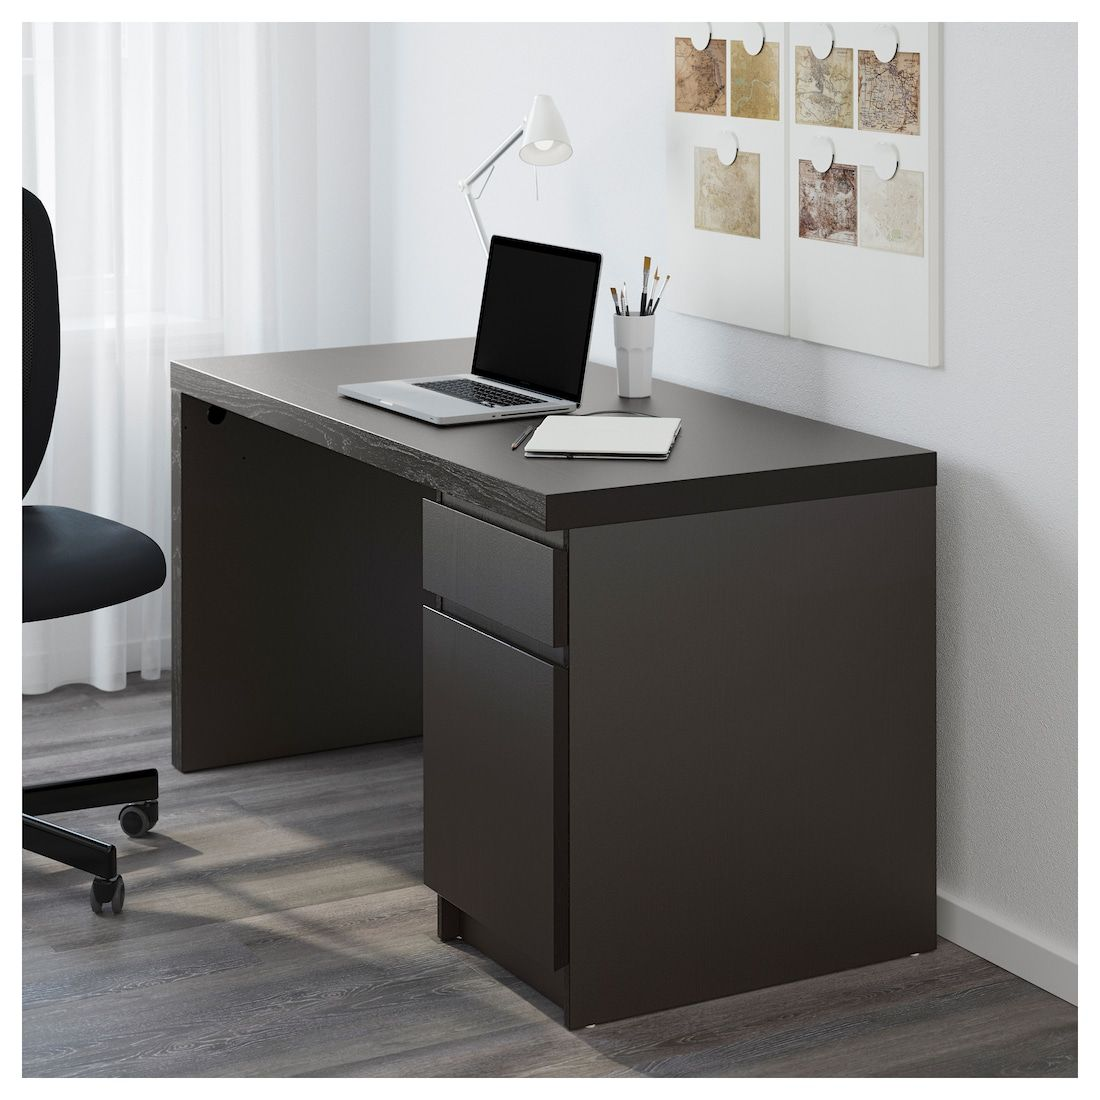 Malm Desk Black Brown 55 1 8x25 5 8 Ikea Malm Desk Best